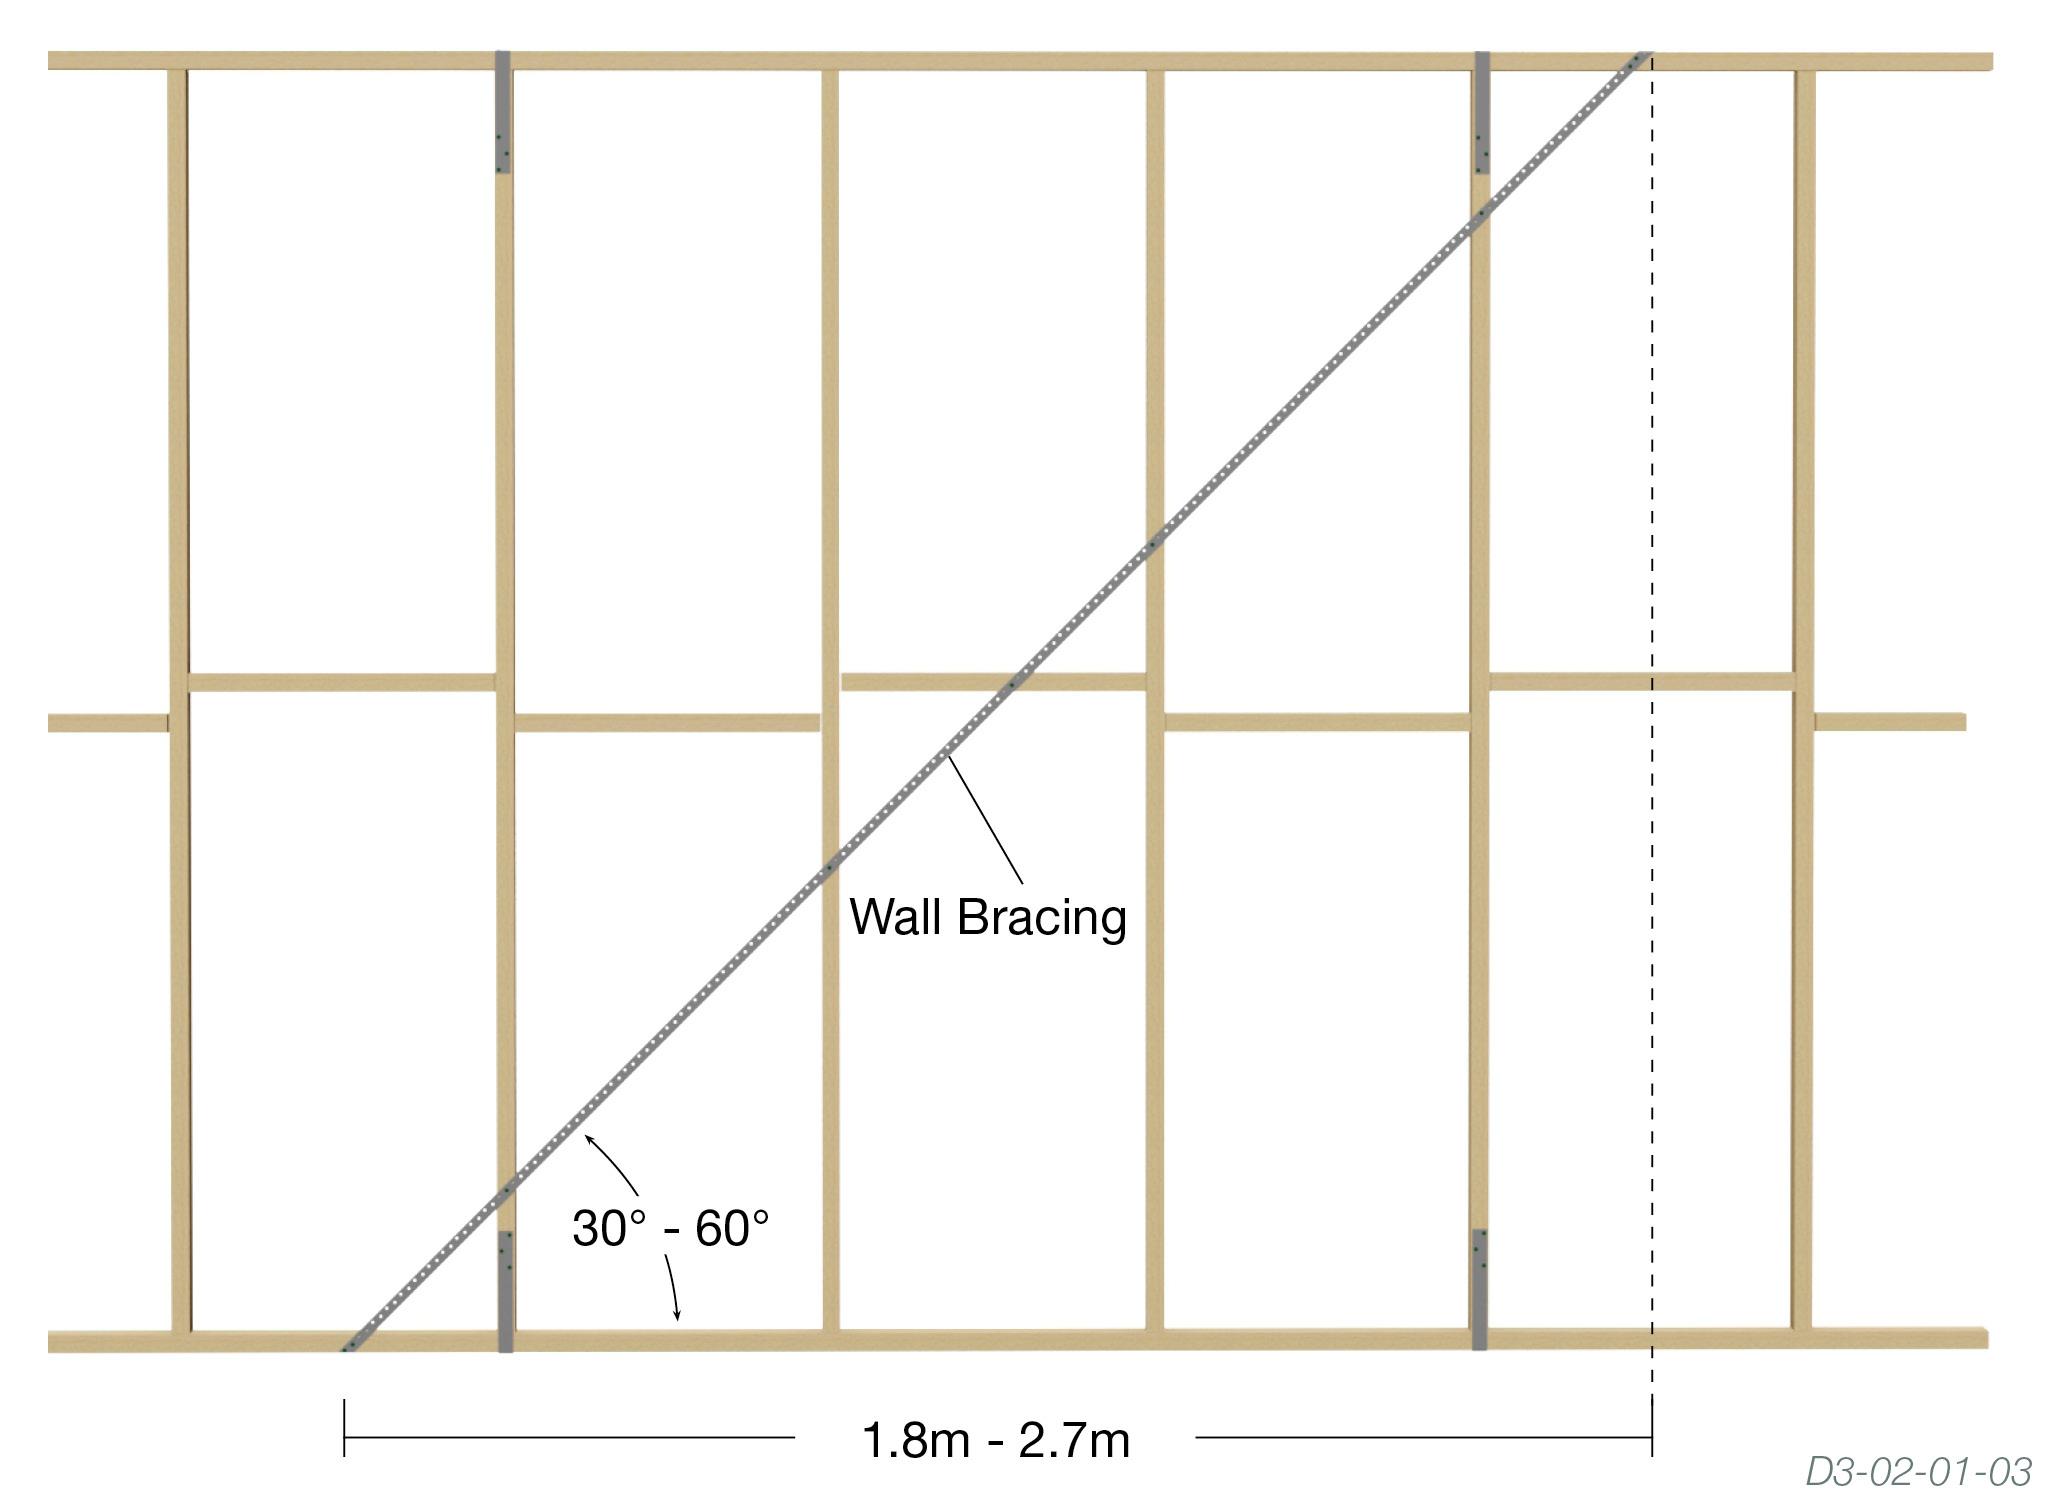 Angle Wall Bracing - The Guide